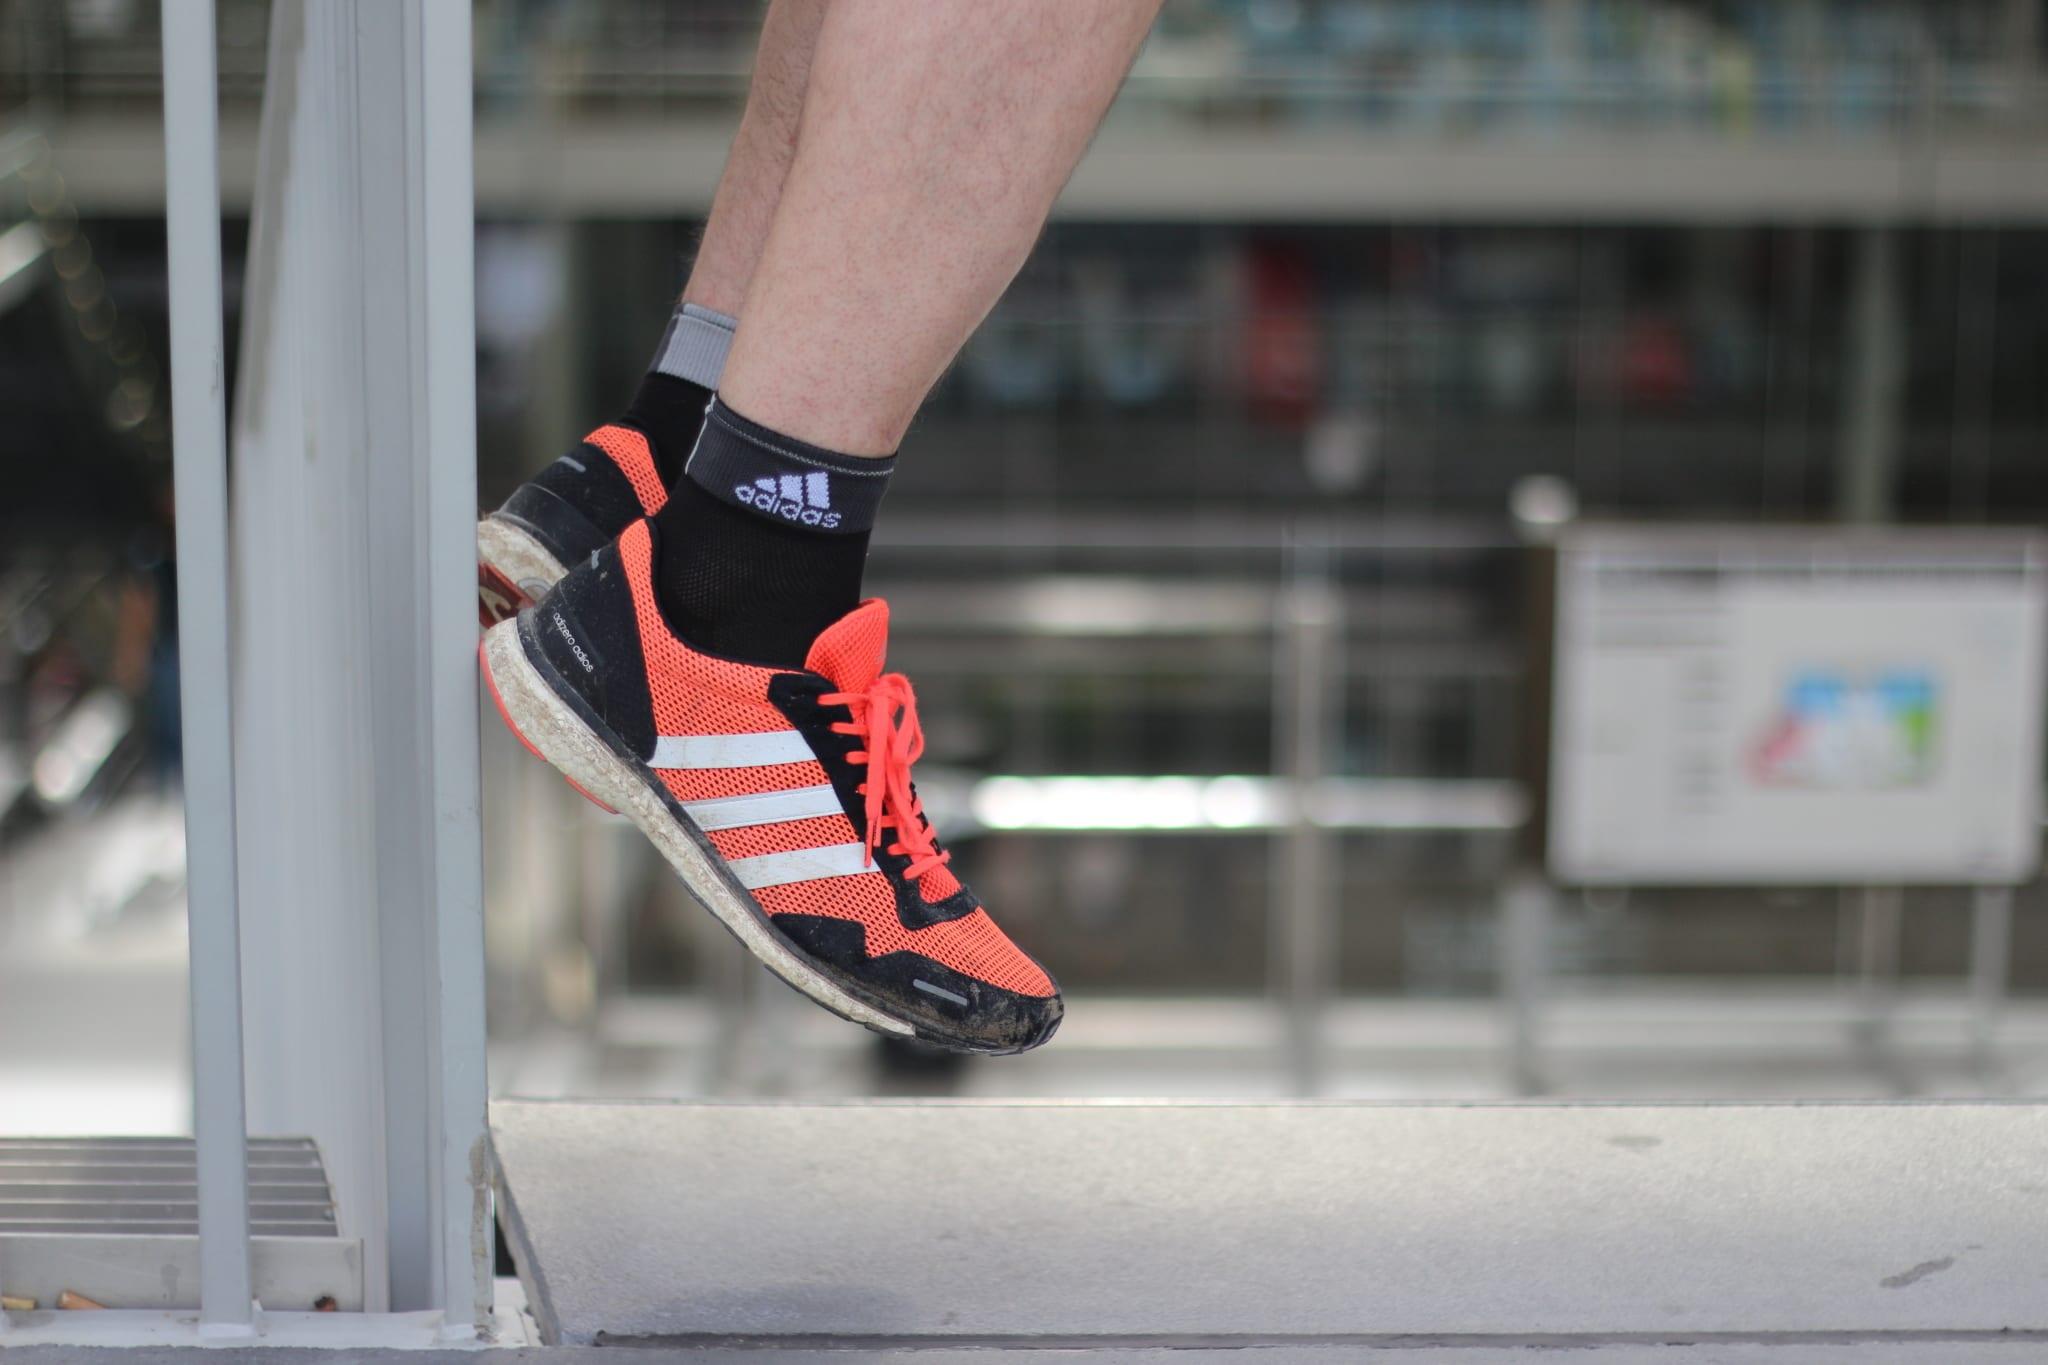 adidas adizero adios bottes 3.0 review